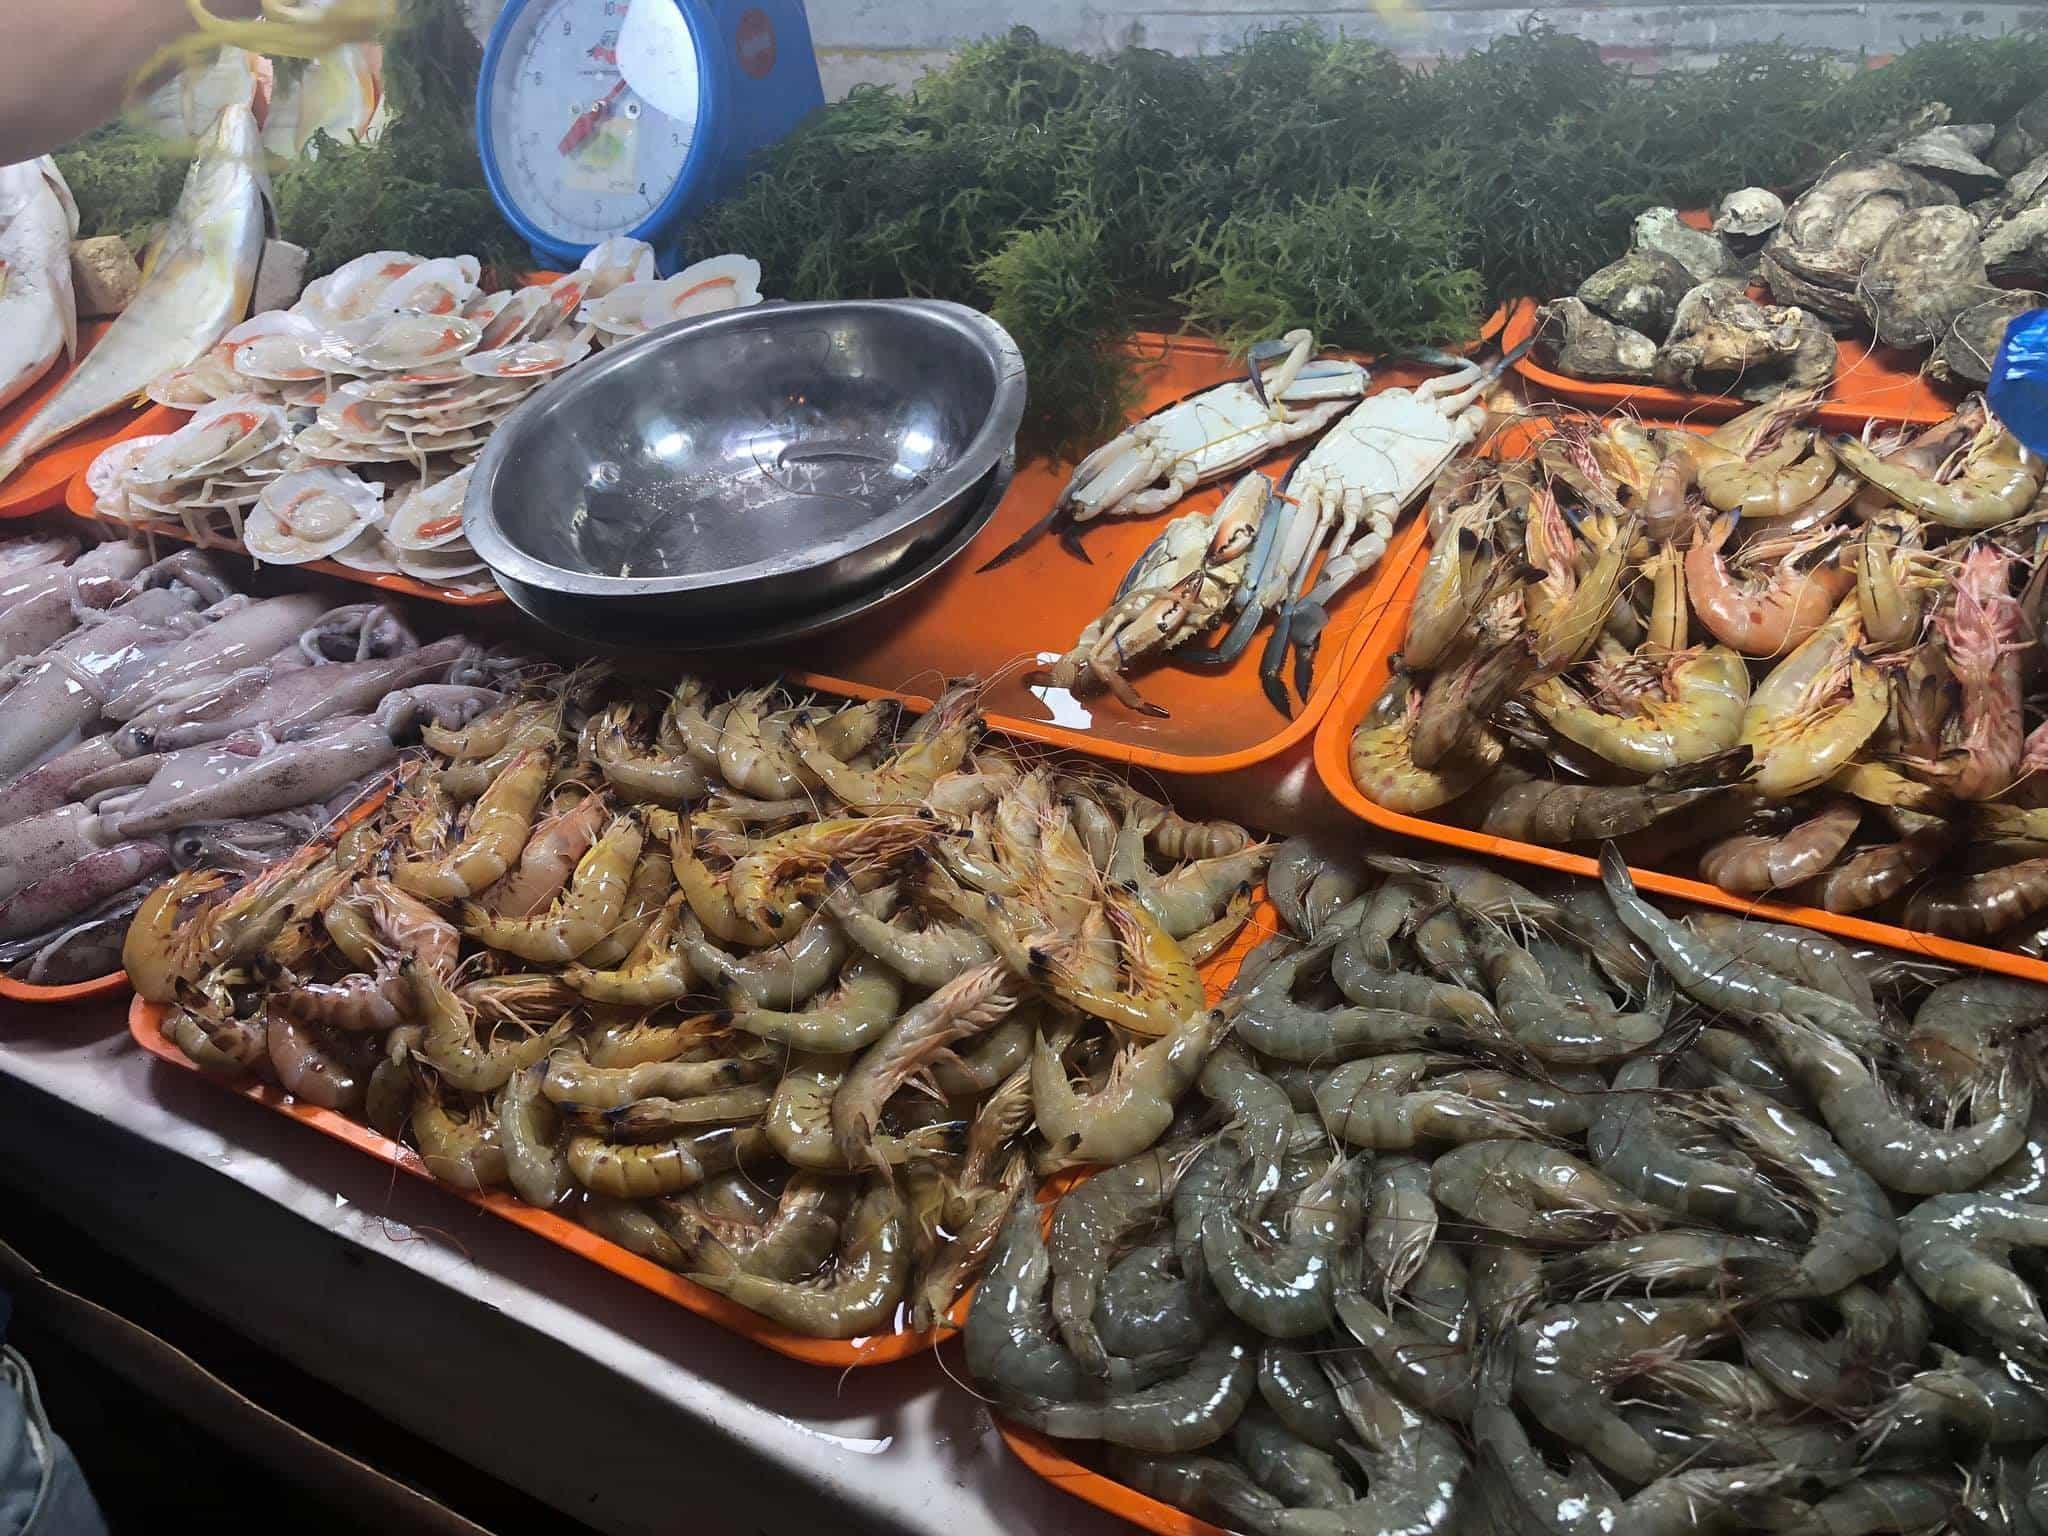 Seafood Restaurant, Iloilo delicacies